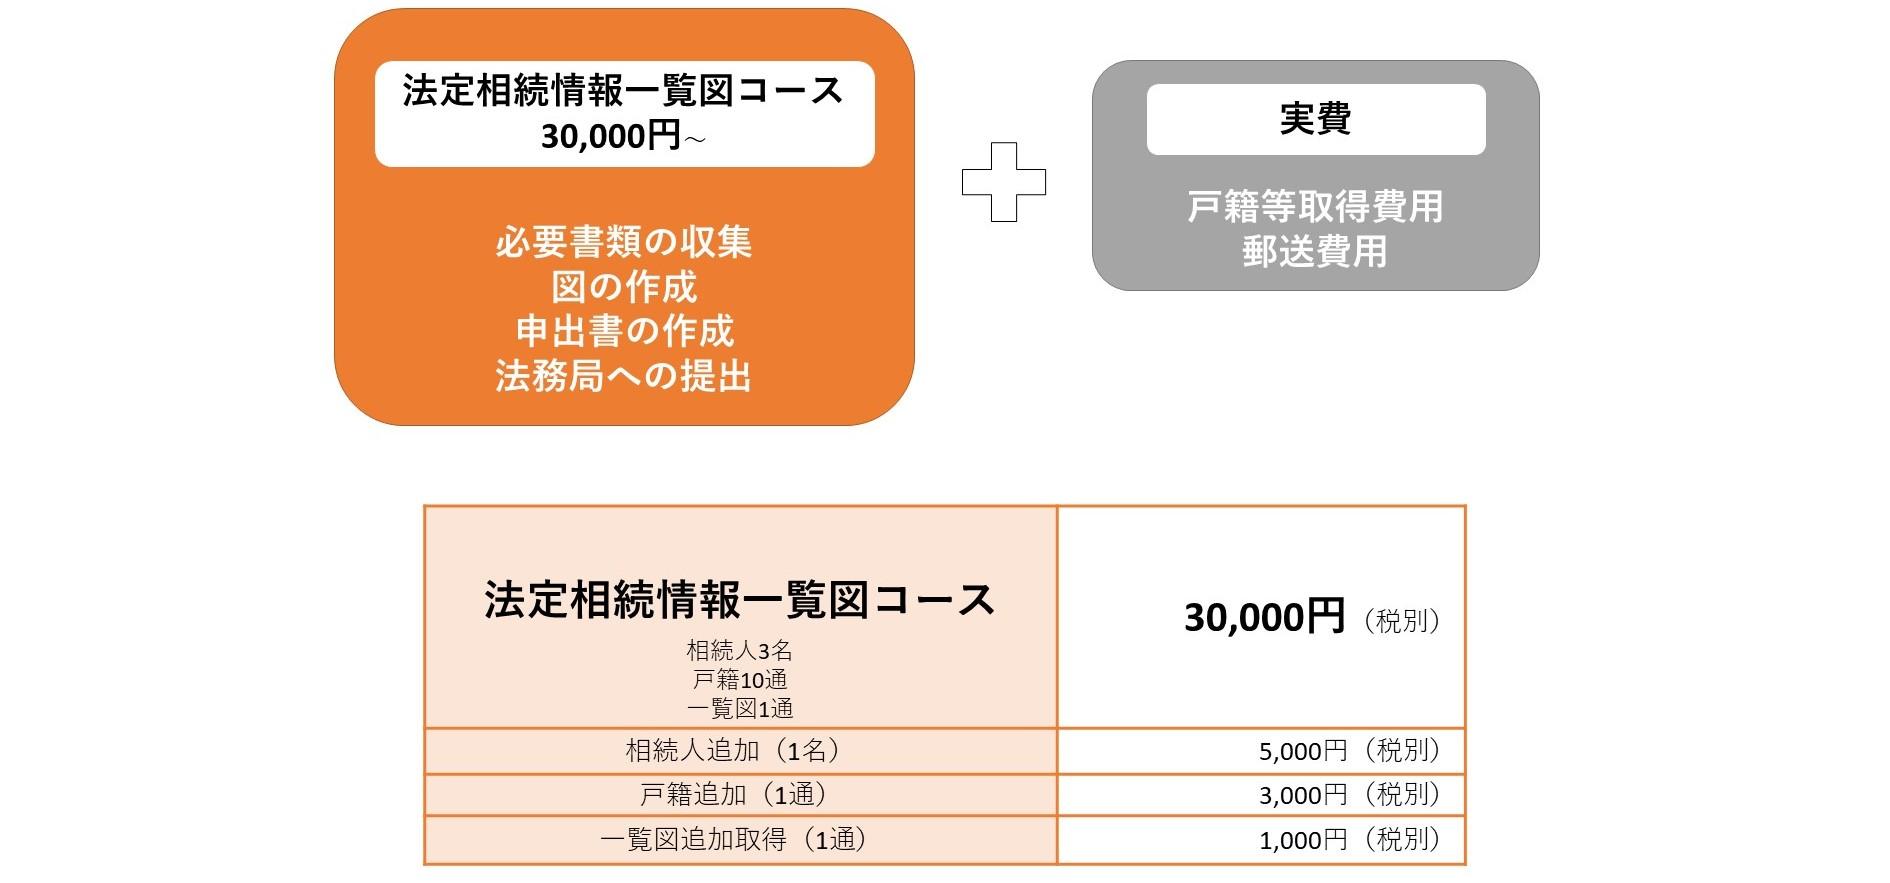 法定相続情報一覧図おとは司法書士事務所料金表